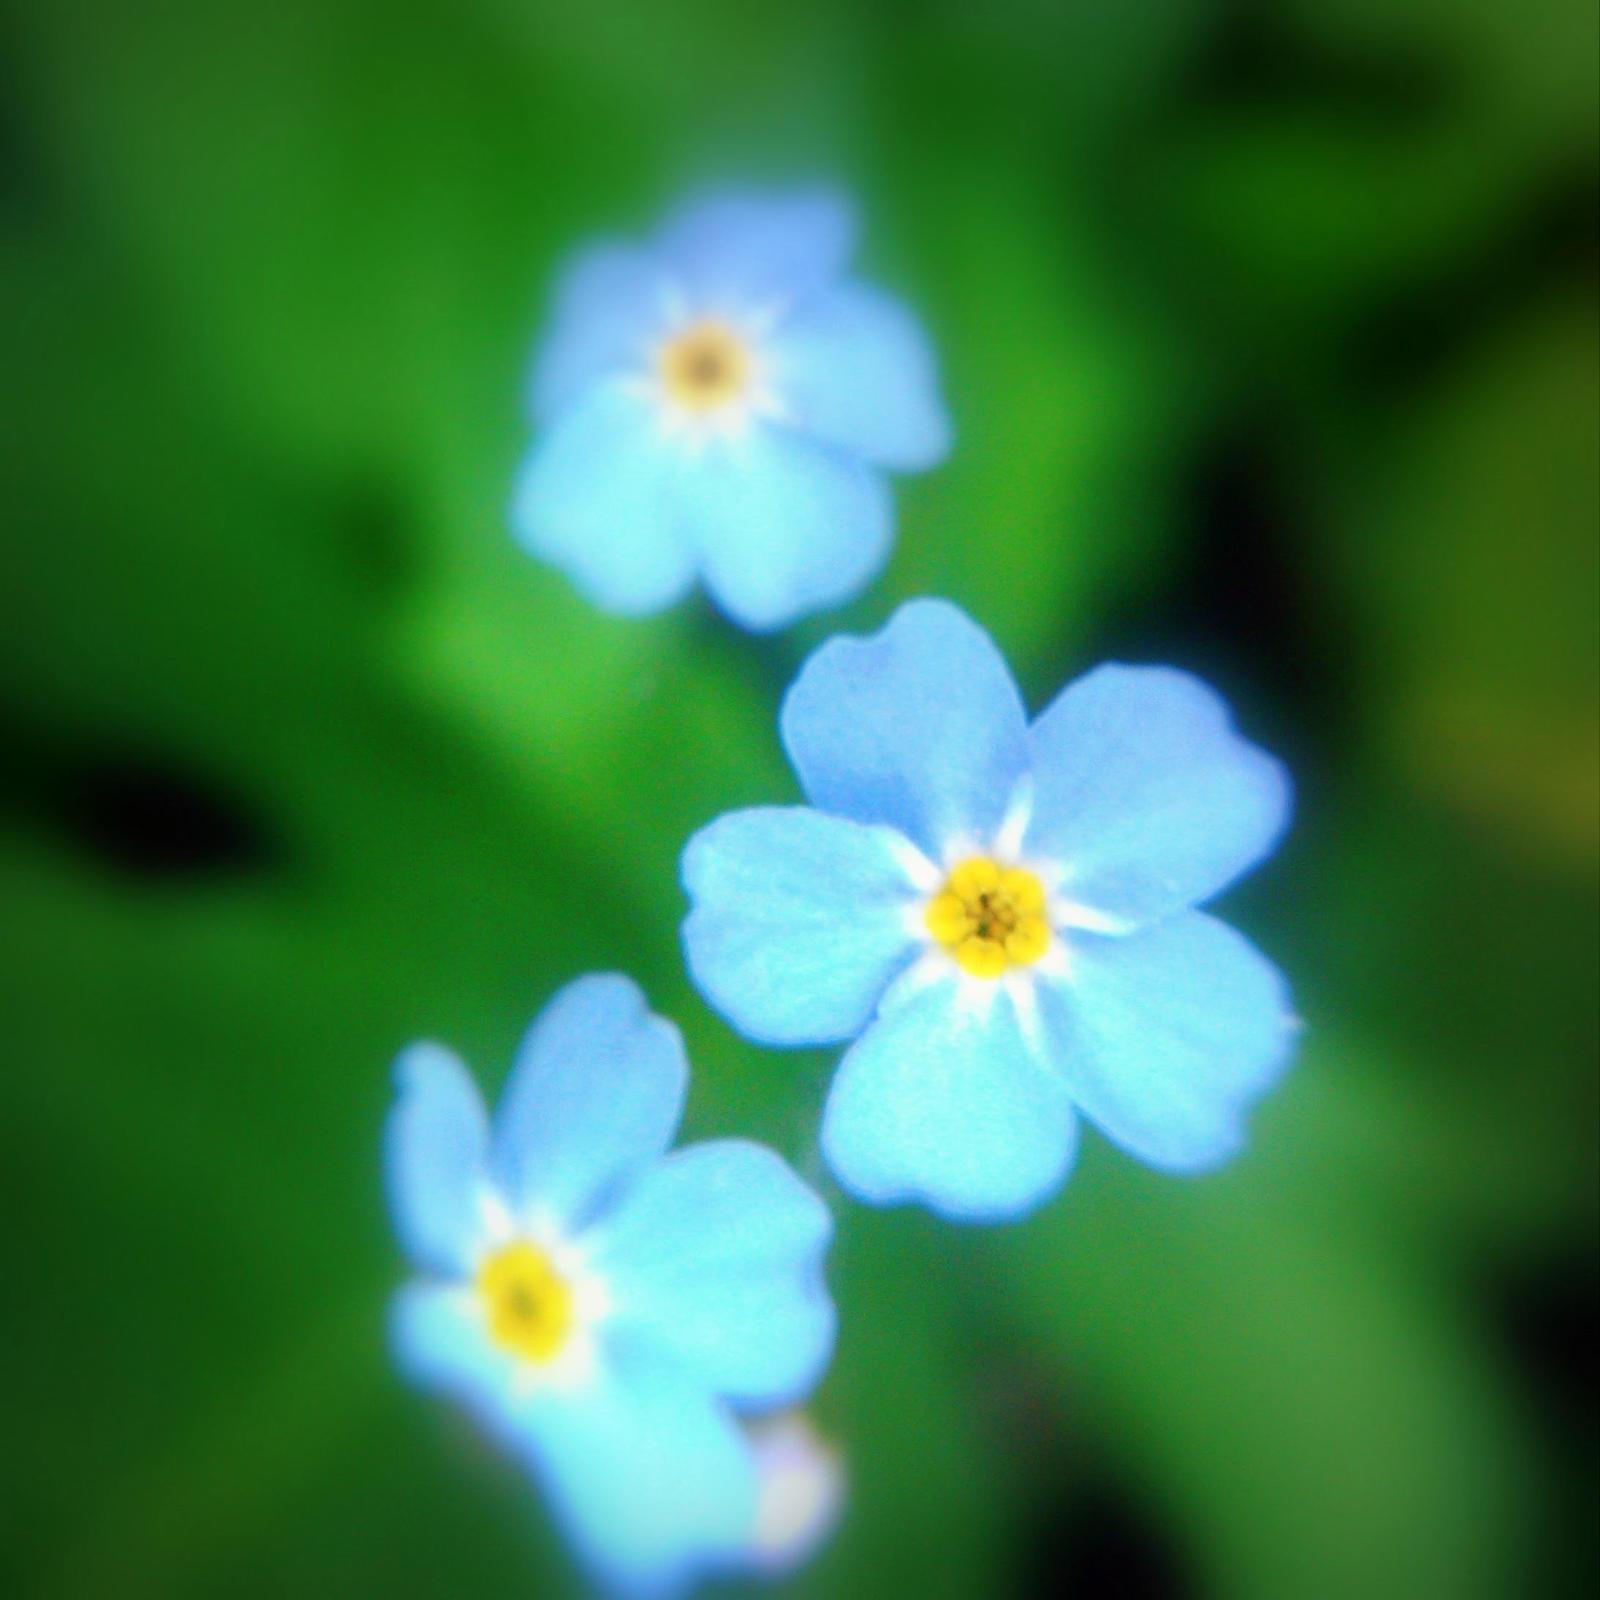 blurred blossom by Mittelfranke